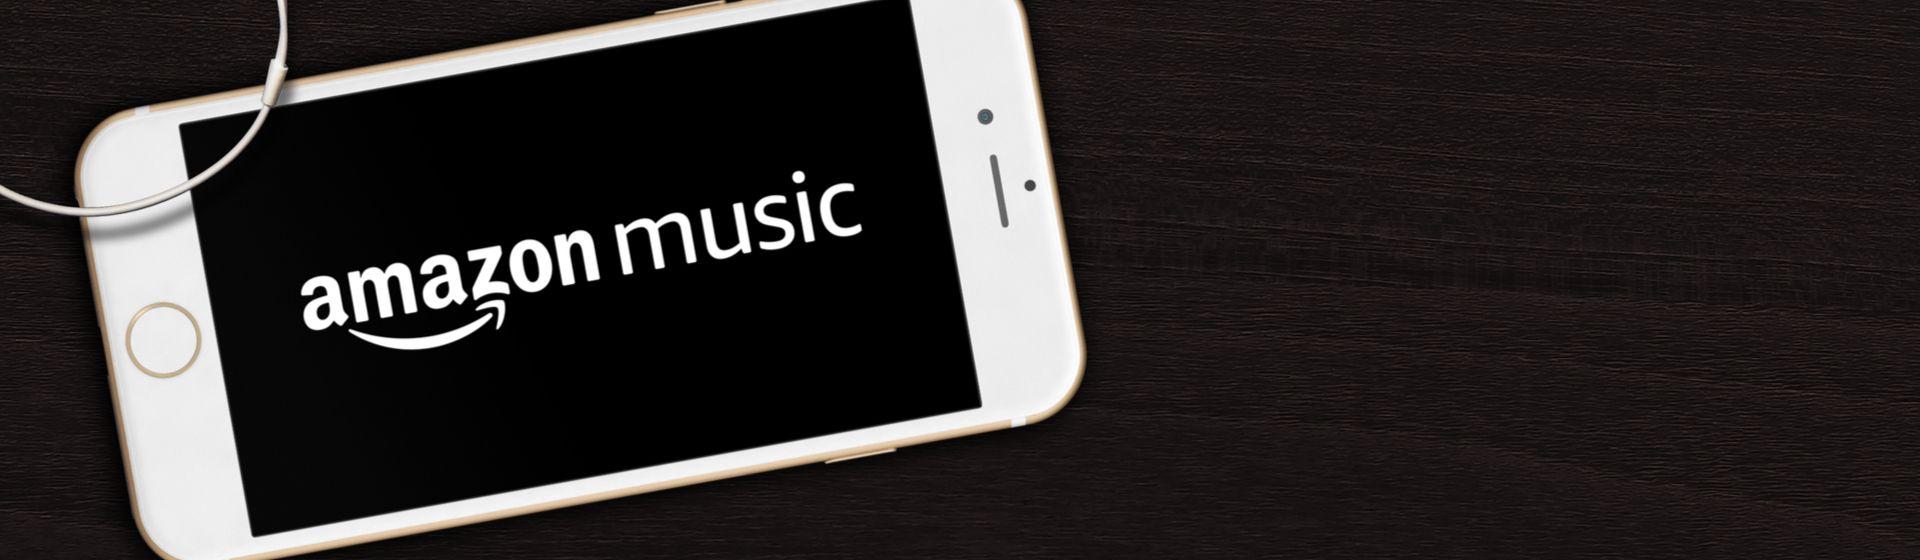 Amazon Music Unlimited: como assinar e usar o app para ouvir músicas